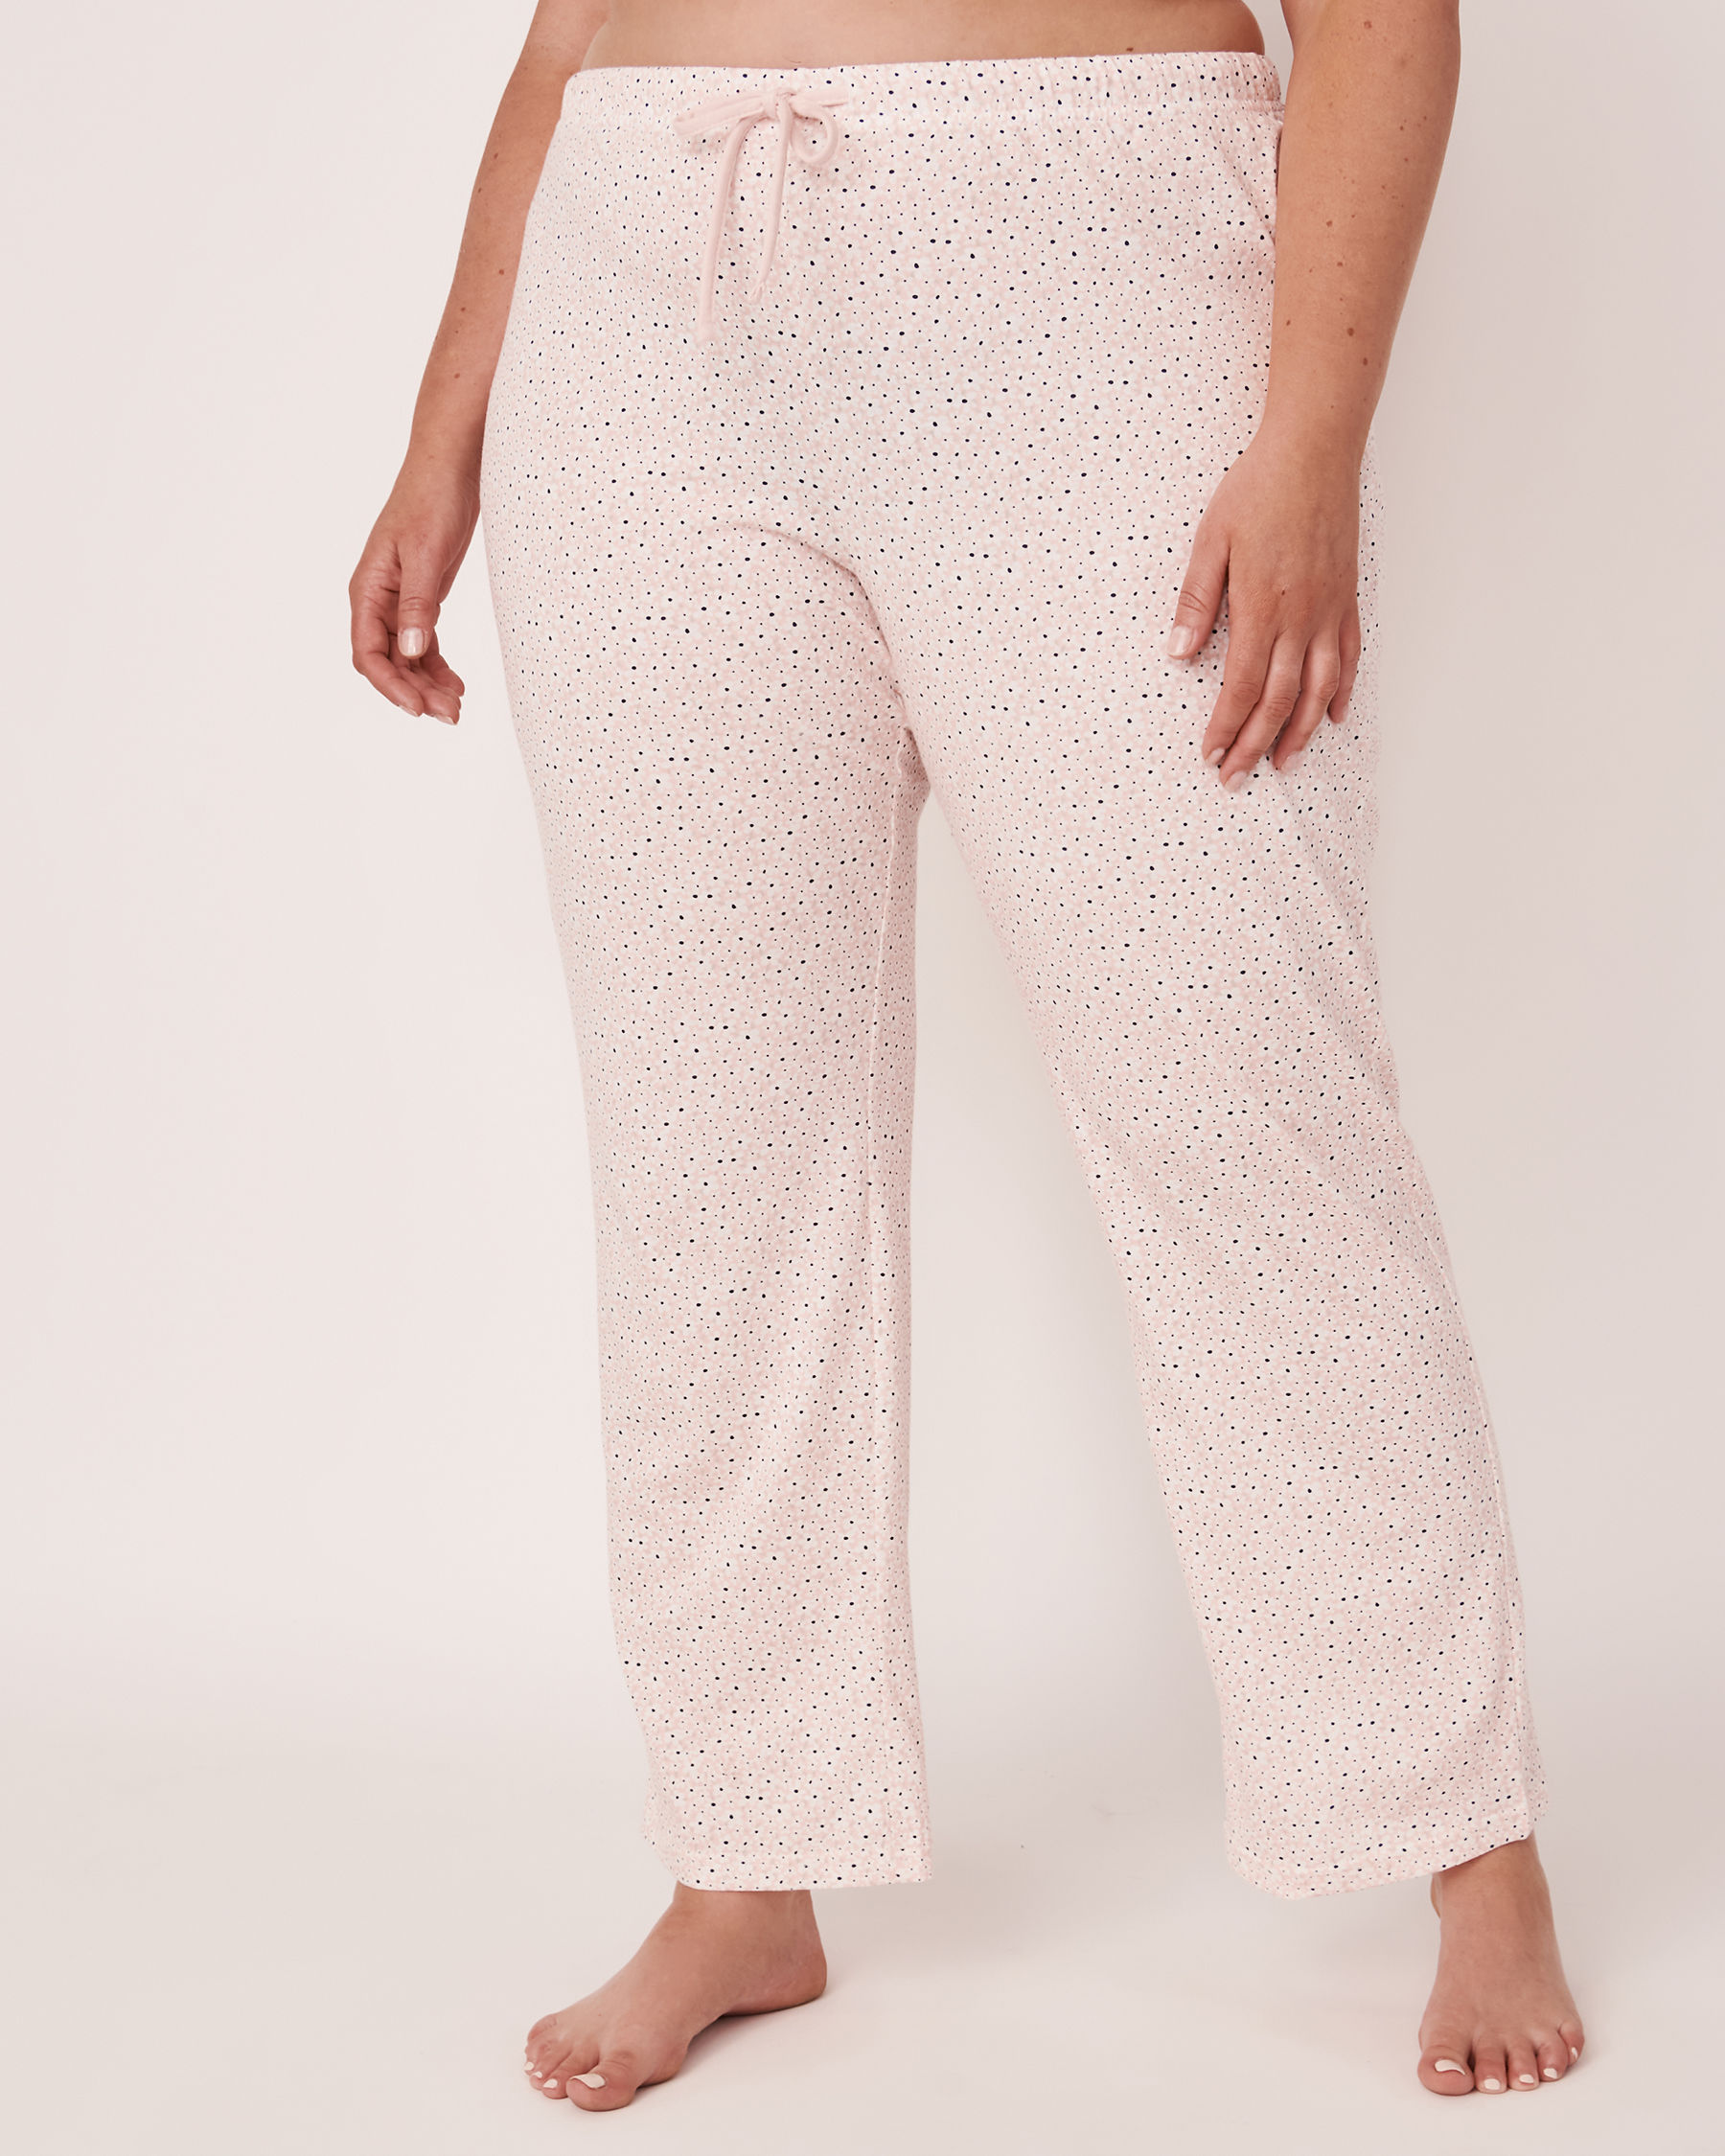 LA VIE EN ROSE Straight Leg Pyjama Pant Flowers 40200110 - View1